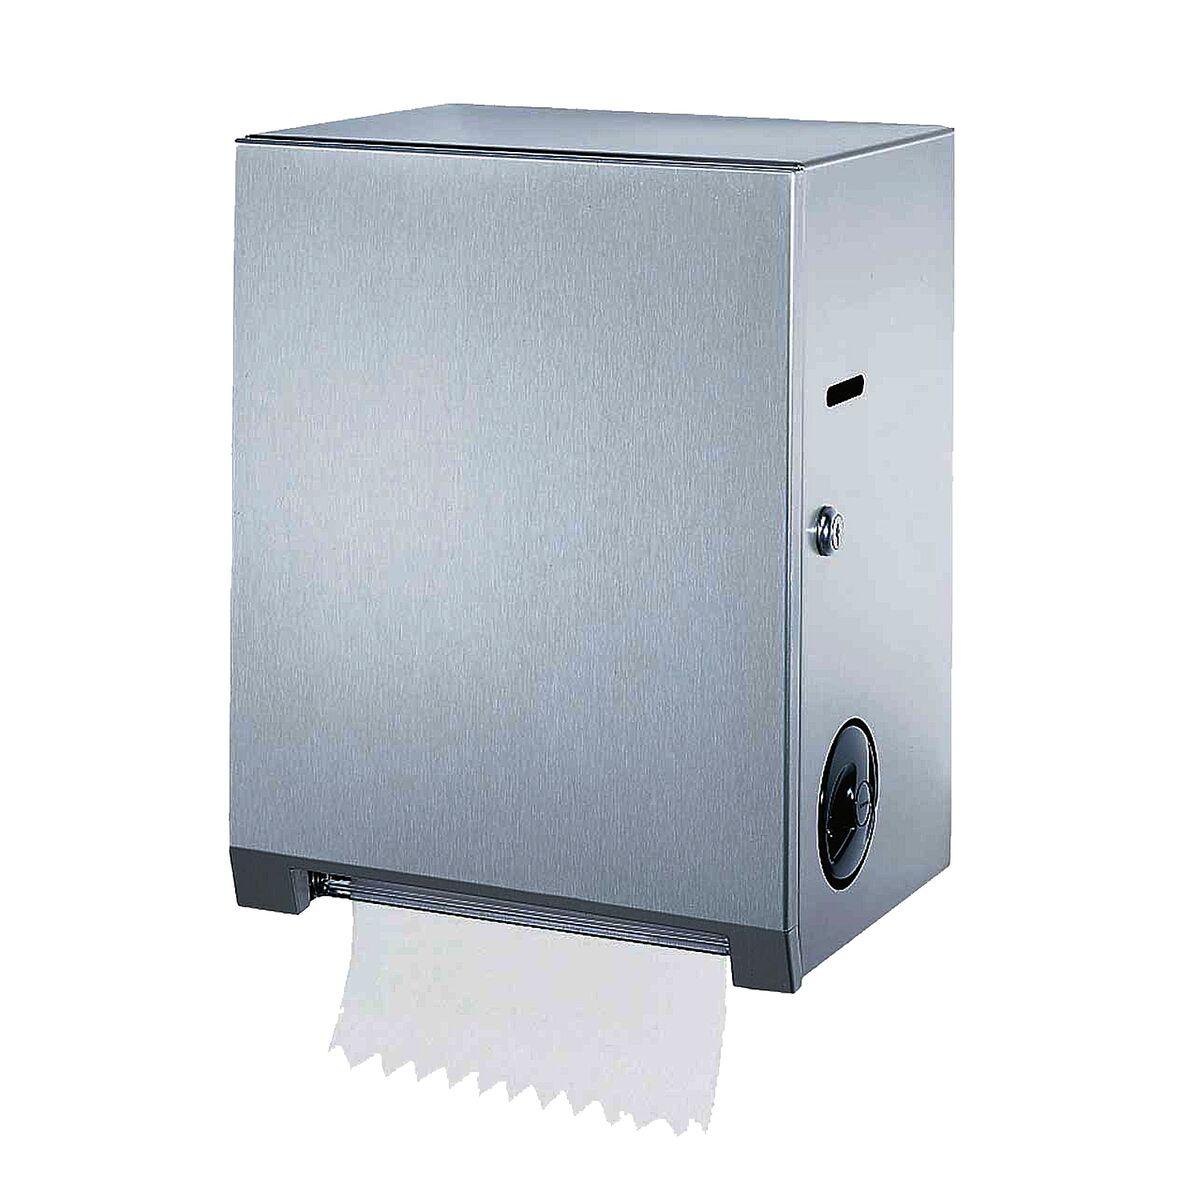 Bobrick Surface Mounted Roll Paper Towel Dispenser Model